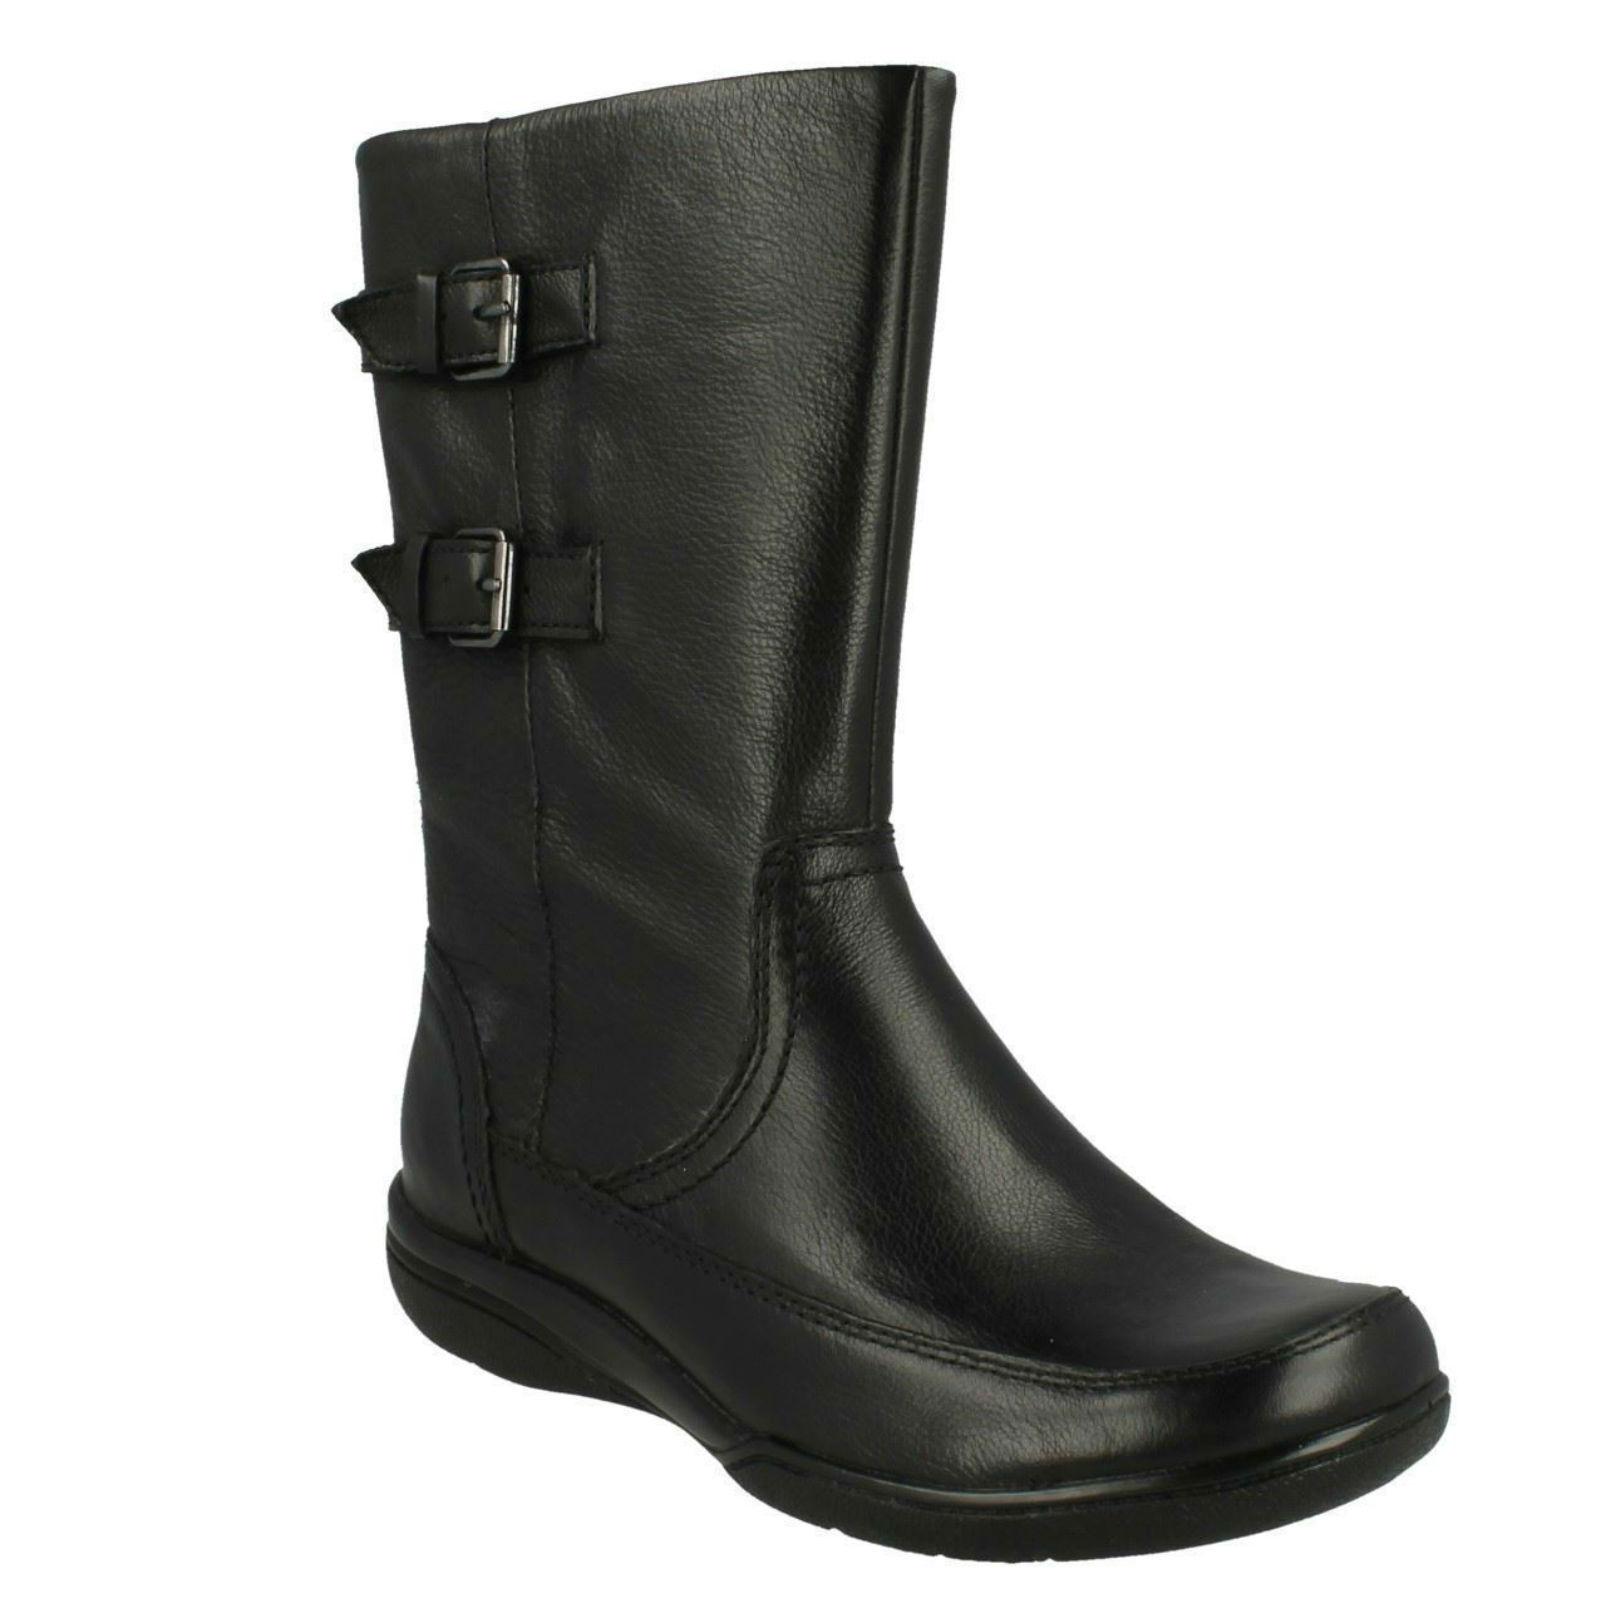 KEARNS RAIN LADIES LADIES LADIES CLARKS ZIP SMART MID CALF LEATHER WINTER BIKER Stiefel SIZE 52f4d0